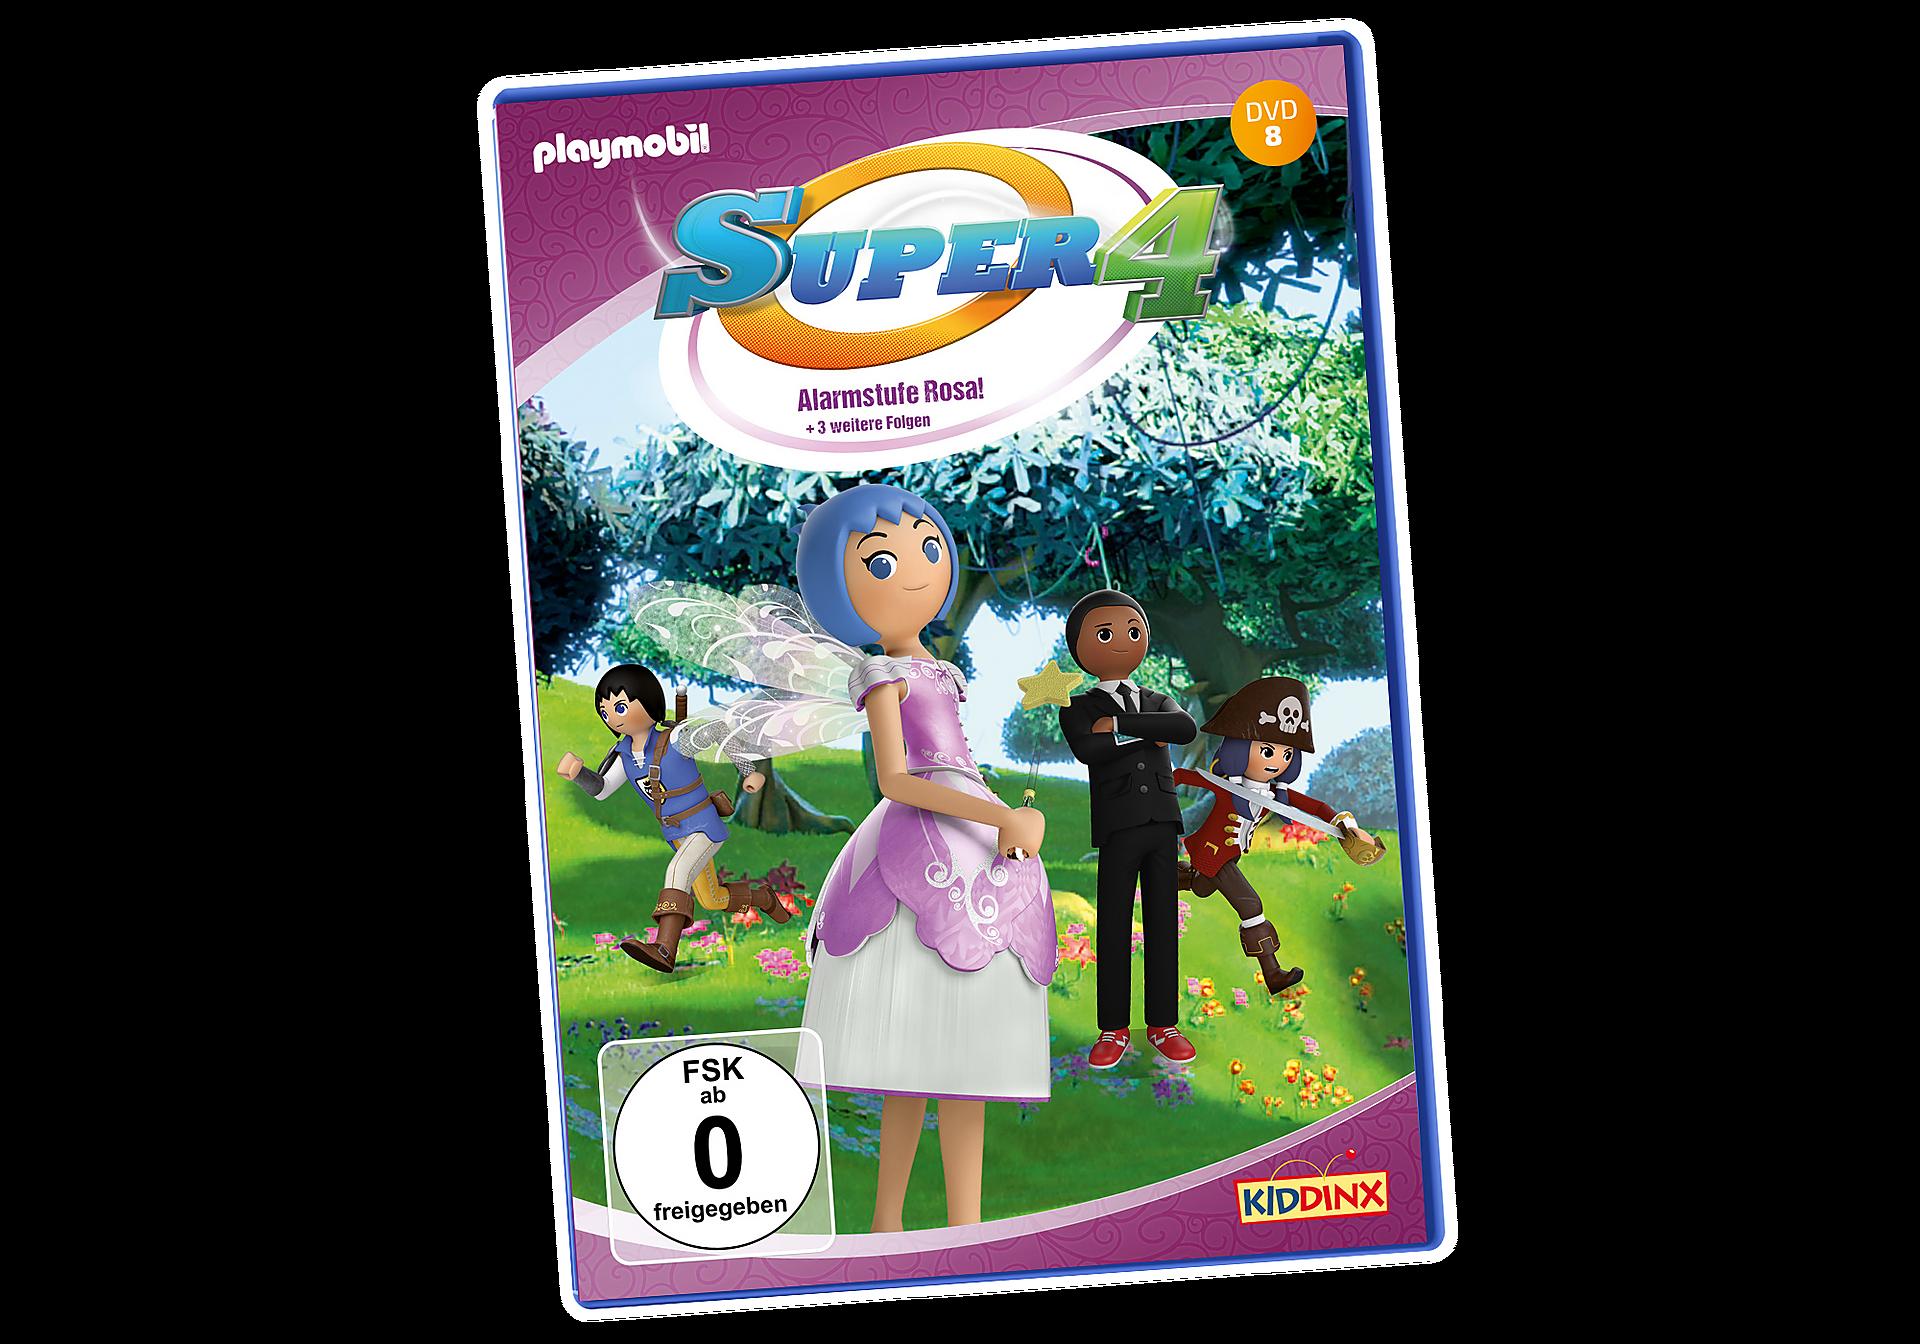 http://media.playmobil.com/i/playmobil/80020_product_detail/DVD Super4: Alarmstufe Rosa!